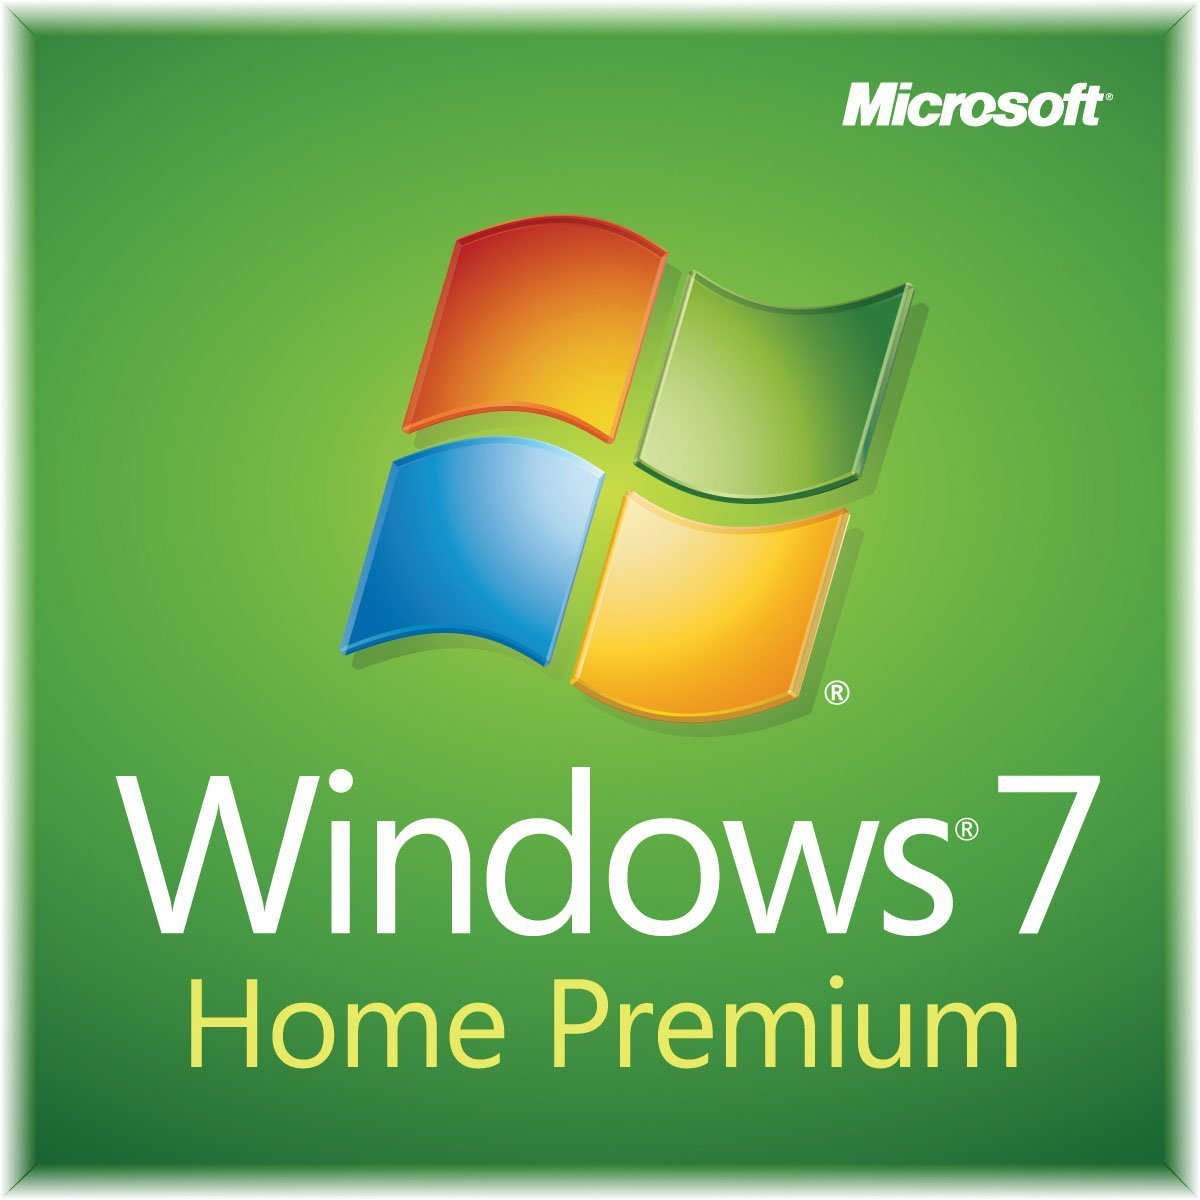 Windows 7 Home Premium Sp1 32Bit (Oem) System Builder Dvd 1 Pack (For Refurbi.. 6